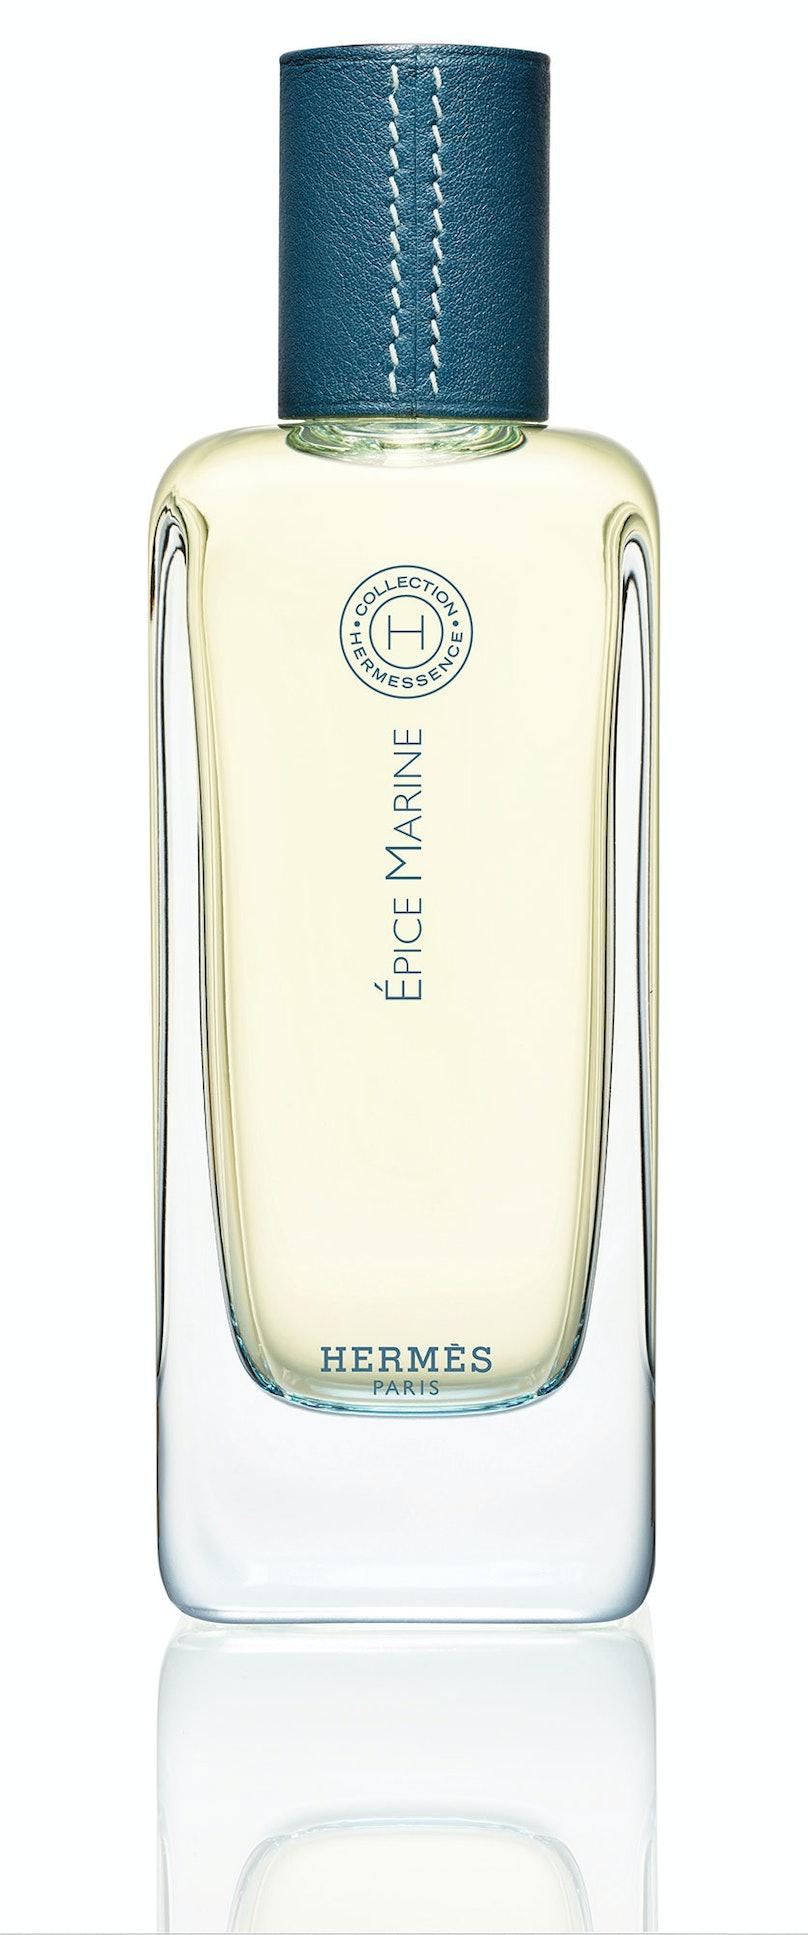 Hermès Hermessence Epice Marine eau de toilette, $240, [usa.hermes.com](http://usa.hermes.com/perfumes/hermessence.html?xtor=SEC-1004).